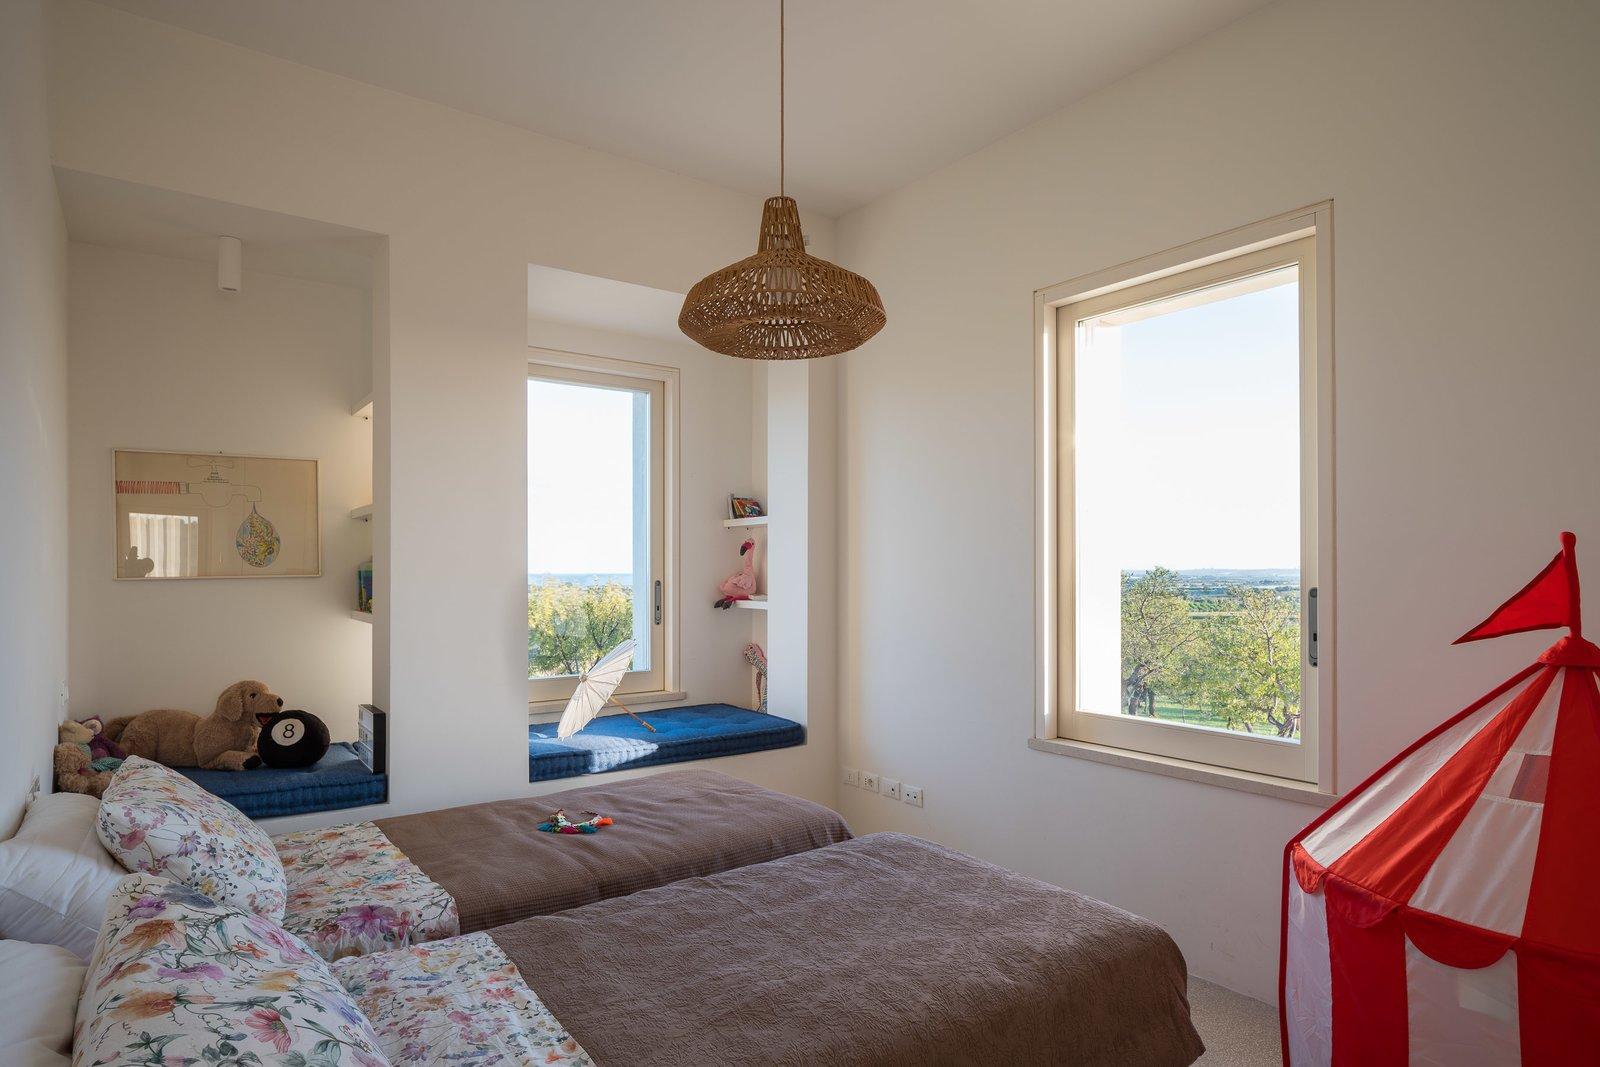 Bedroom, Pendant Lighting, Bench, and Bed Twin bedroom  Cozzo Coniglio